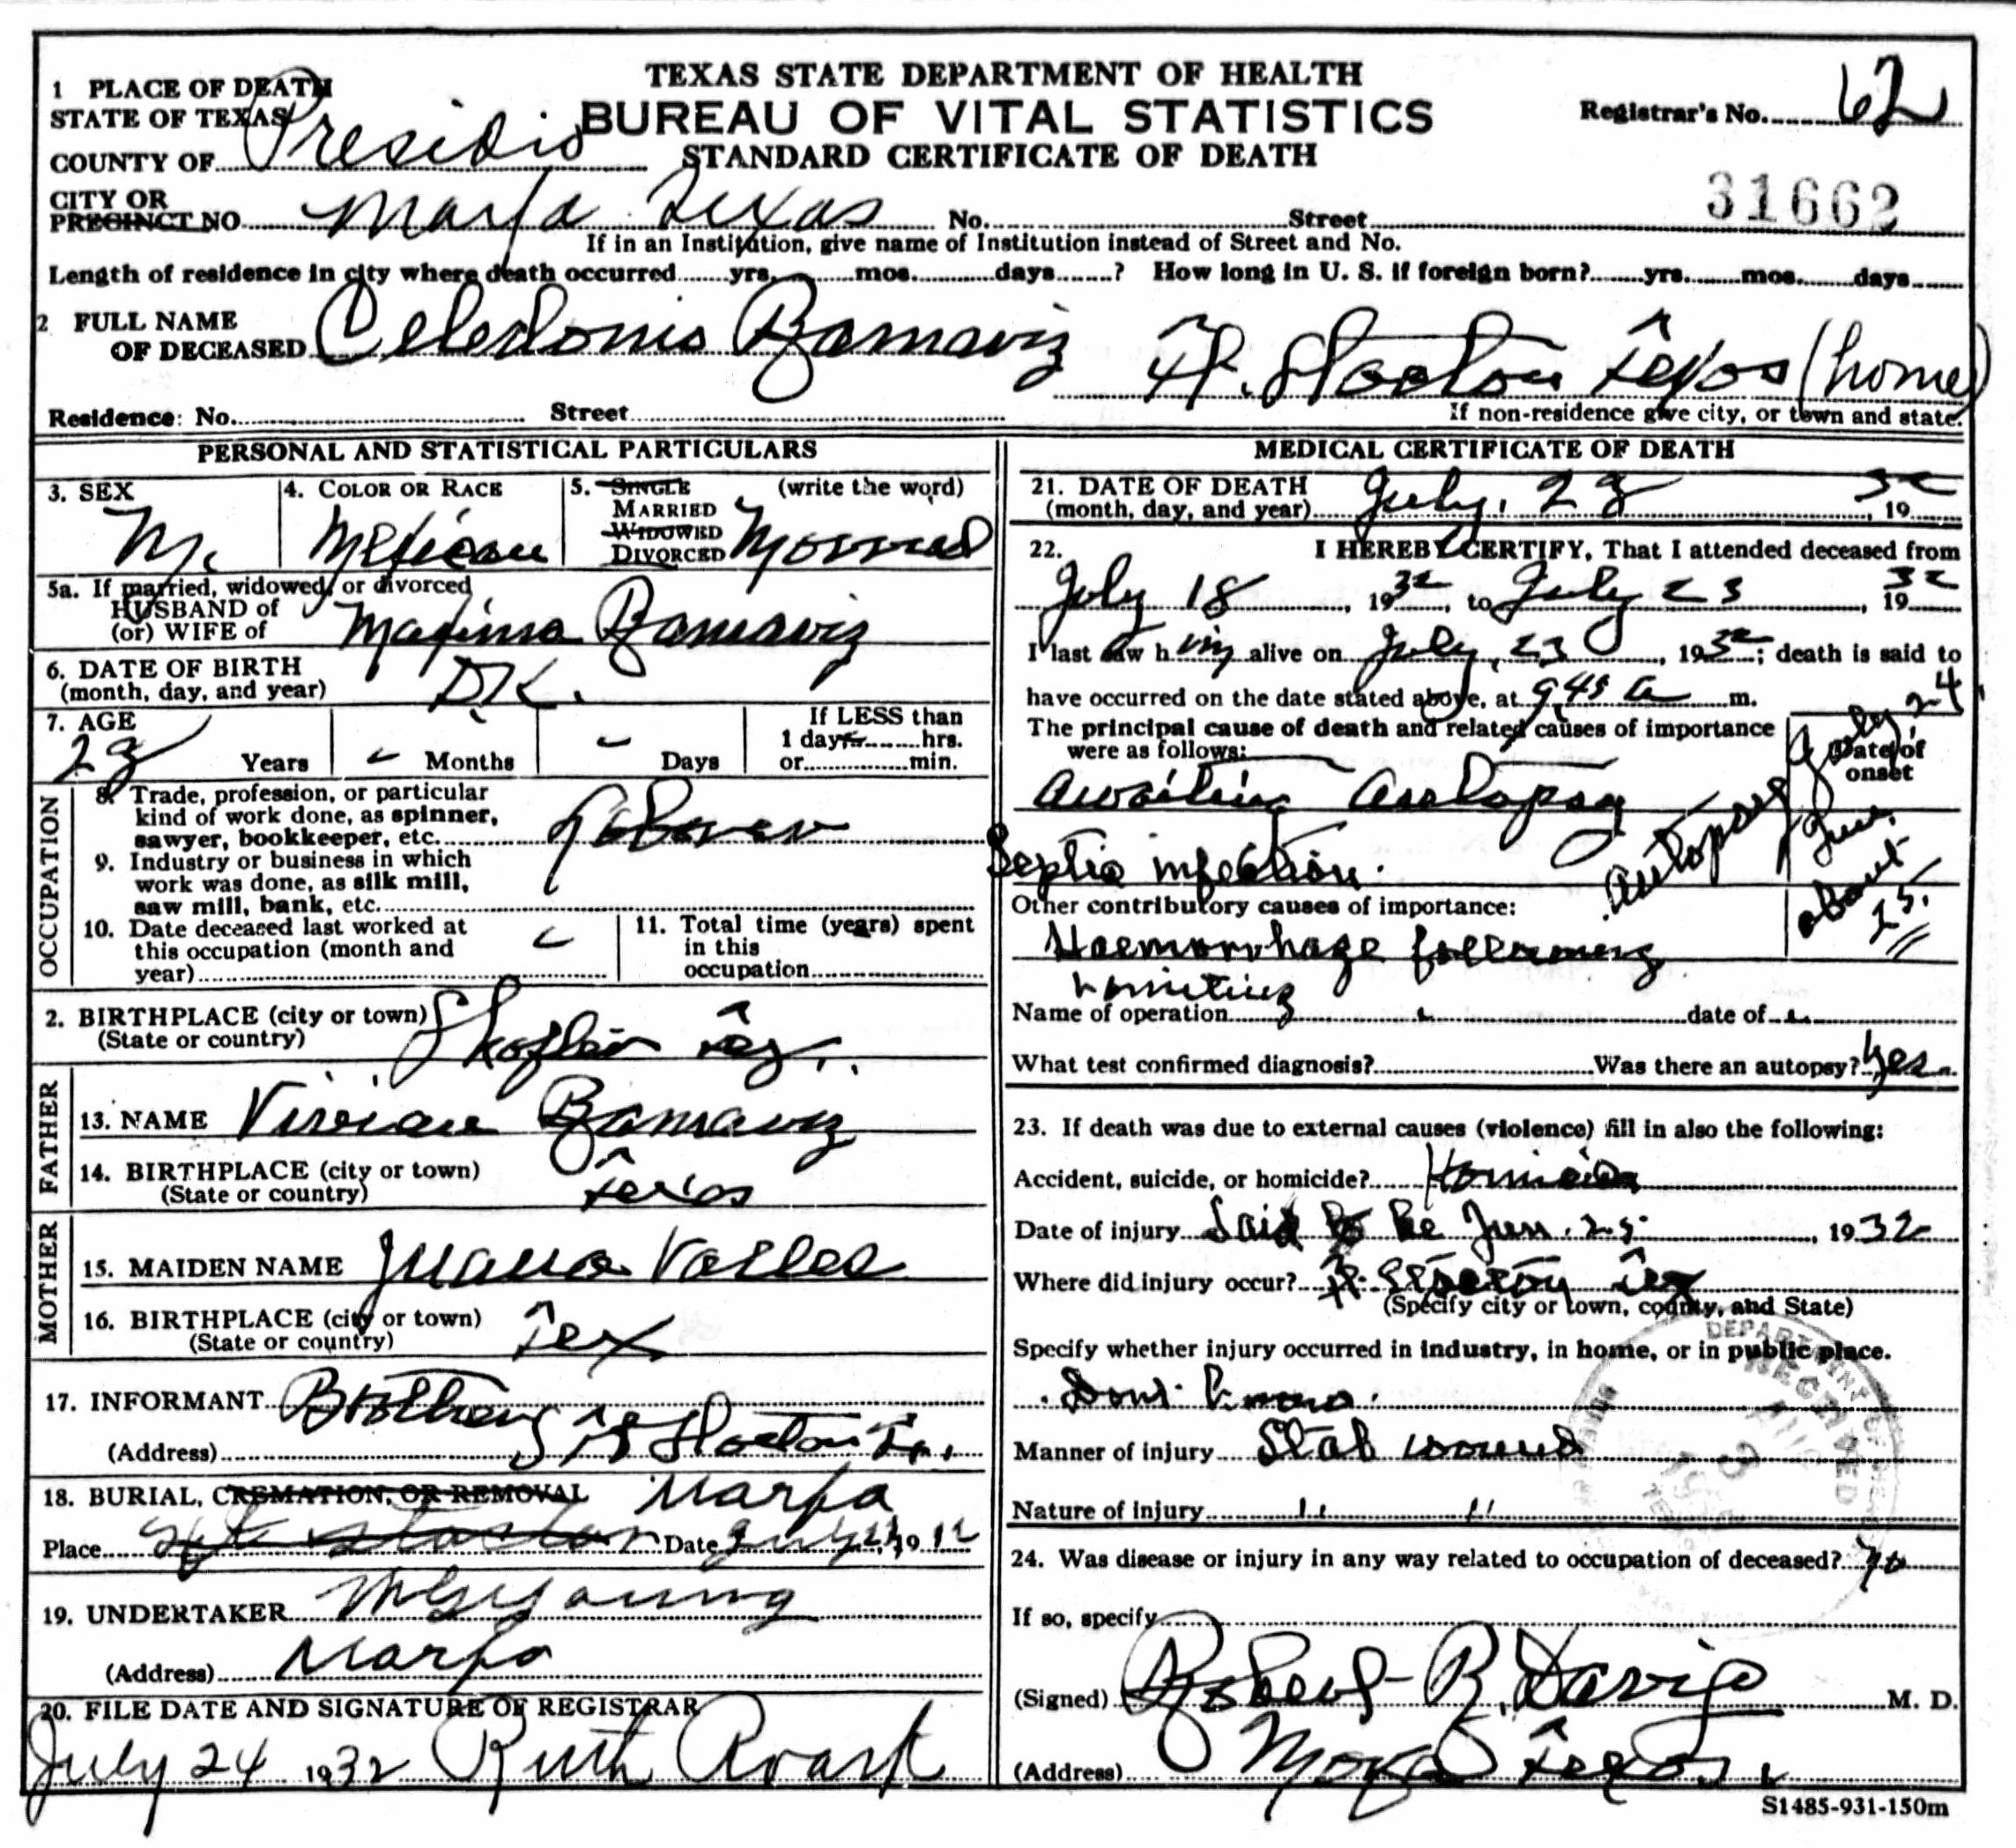 fort stockton texas birth certificate copy